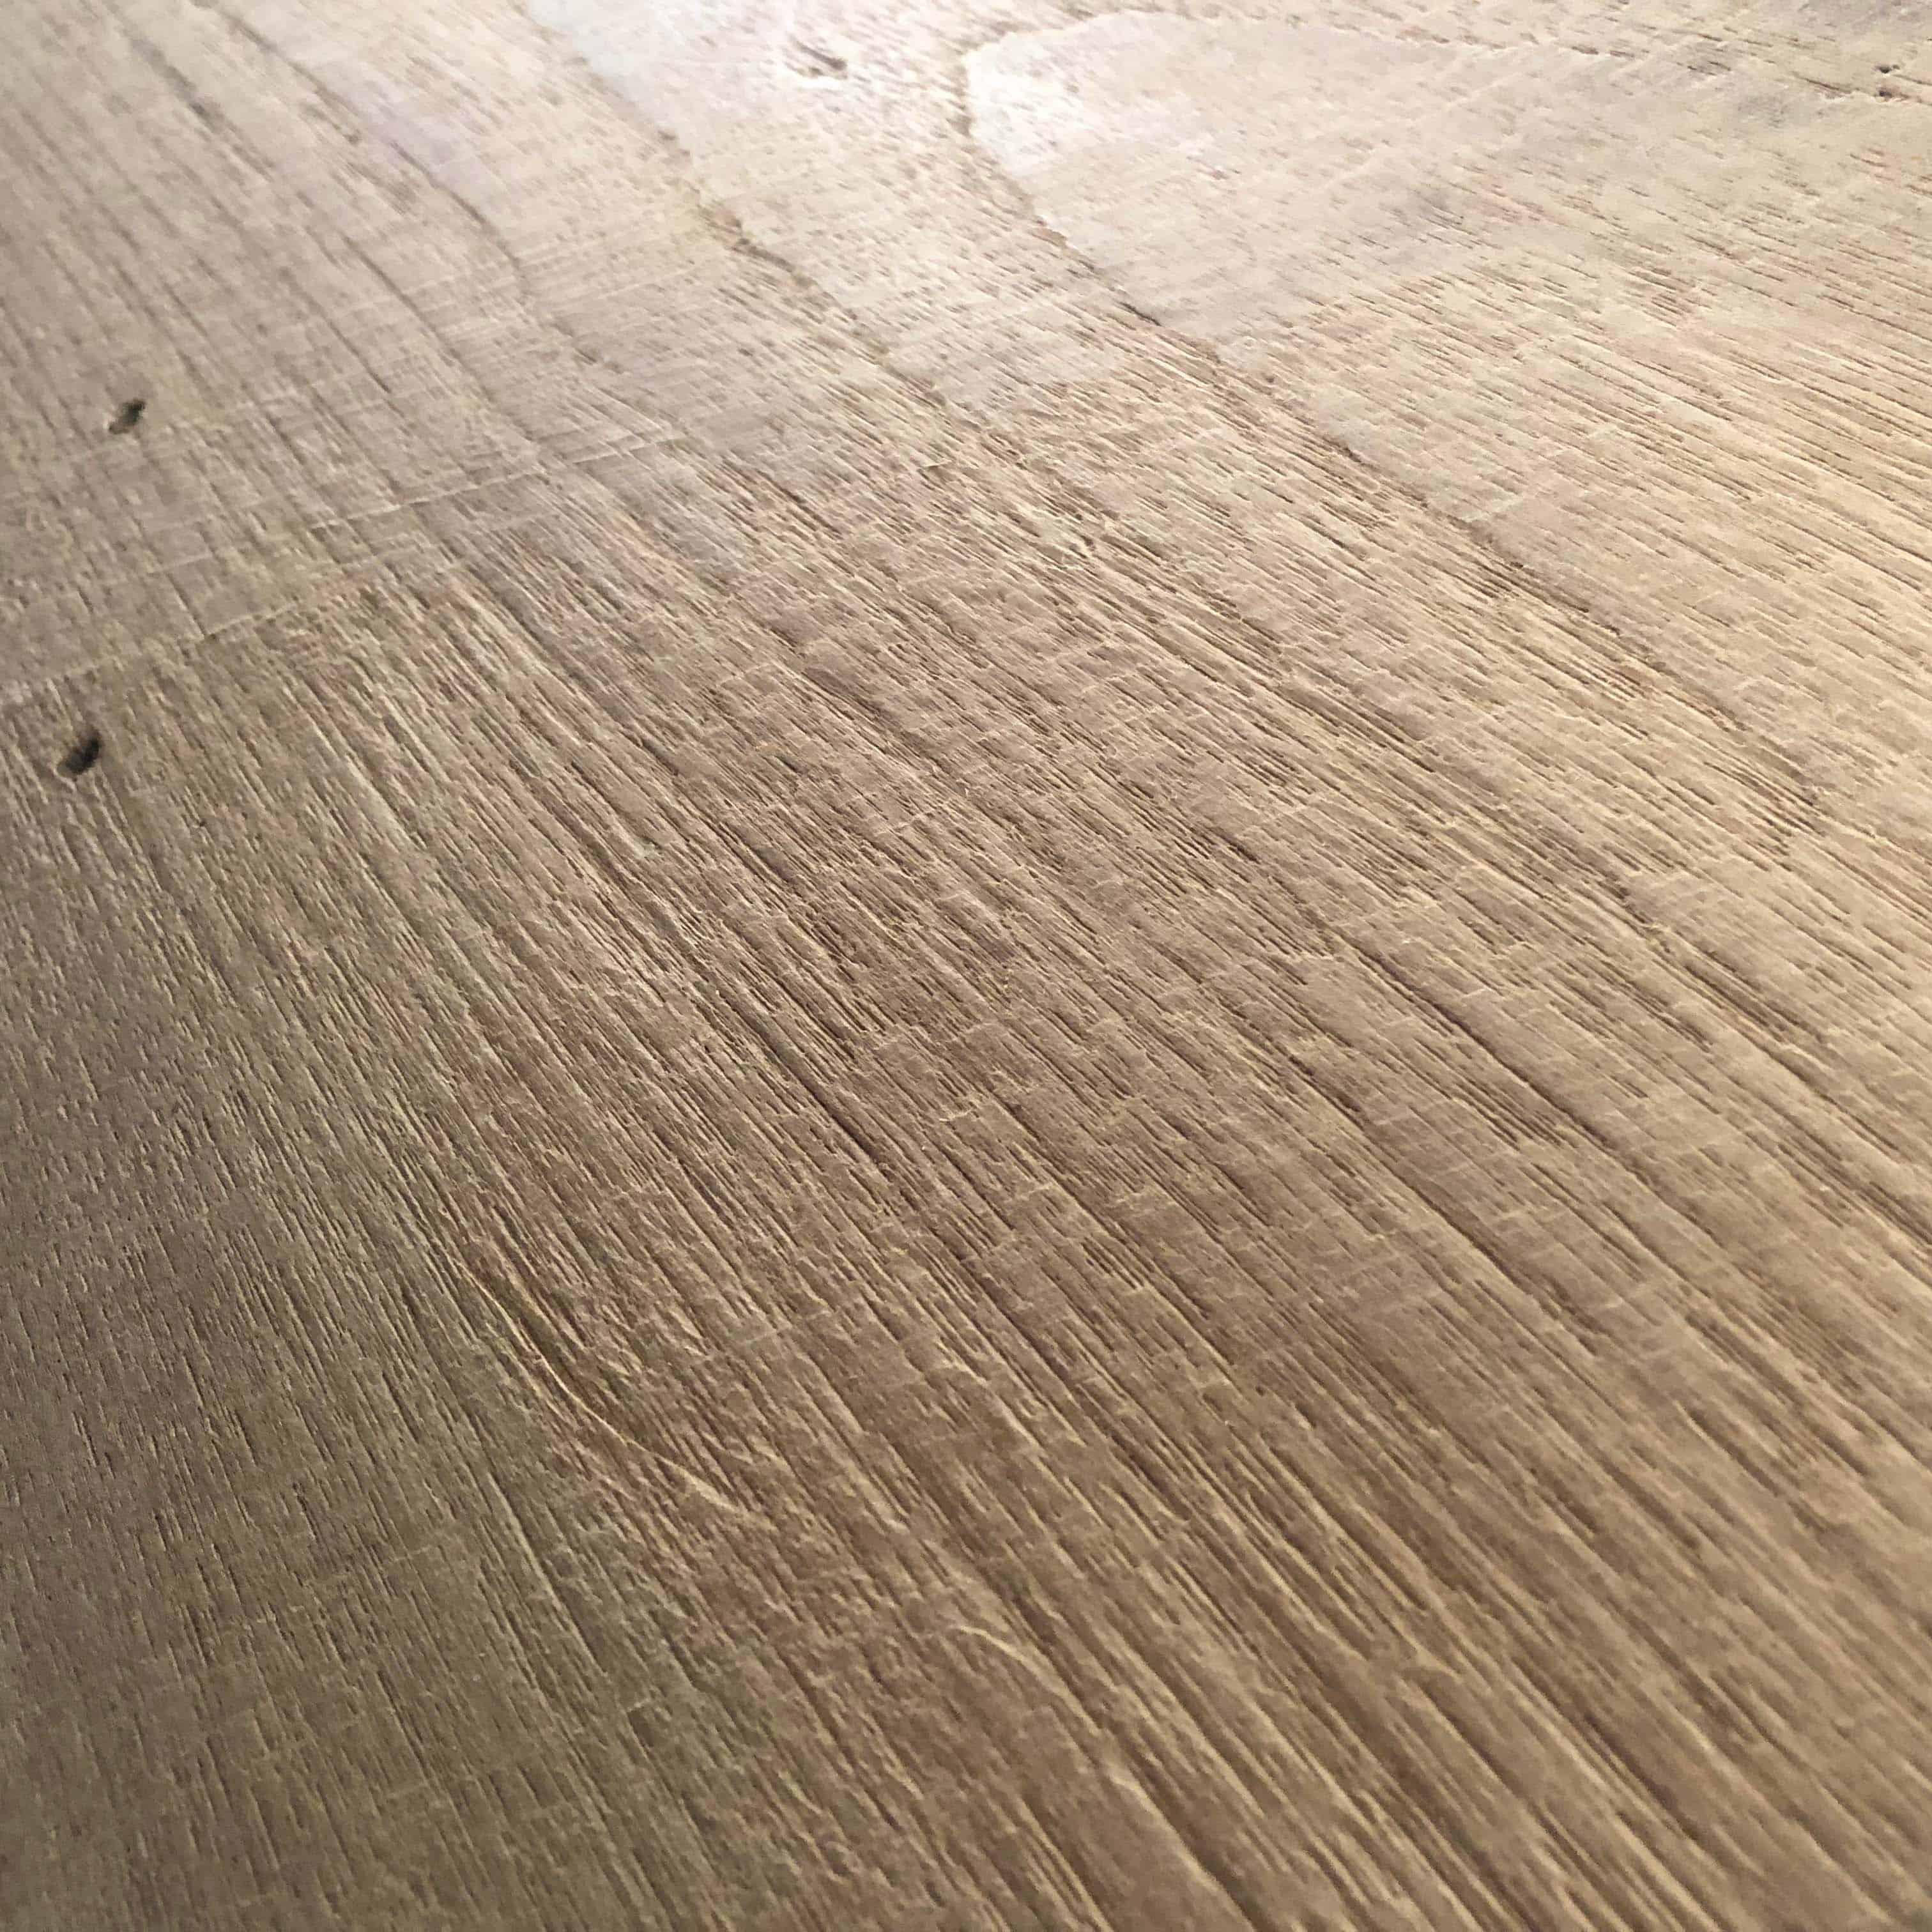 bright patina detail - Reclaimed Teak Flooring